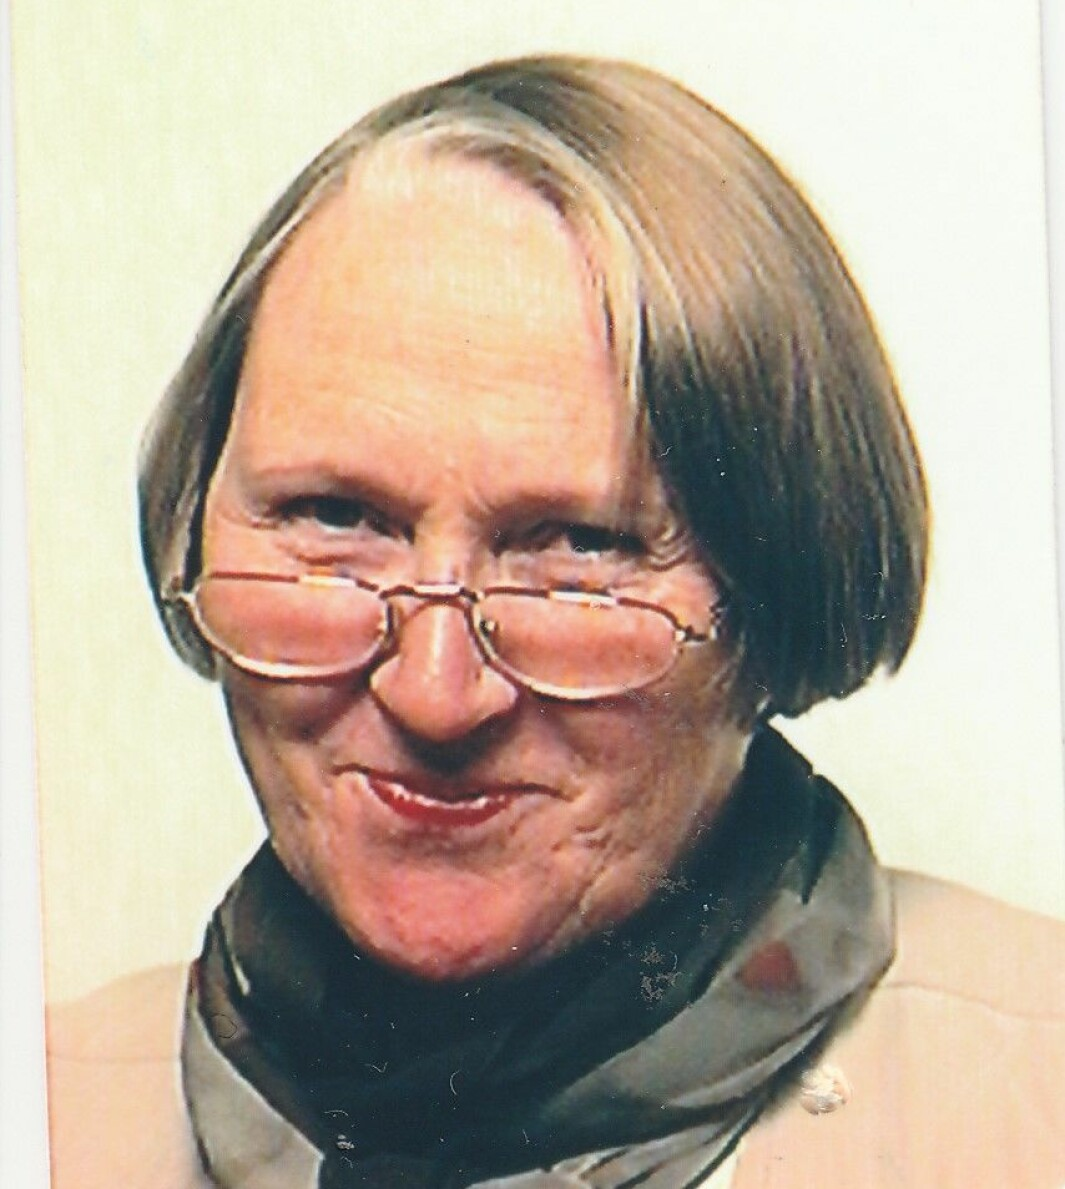 Dordi Glærum Skuggevik